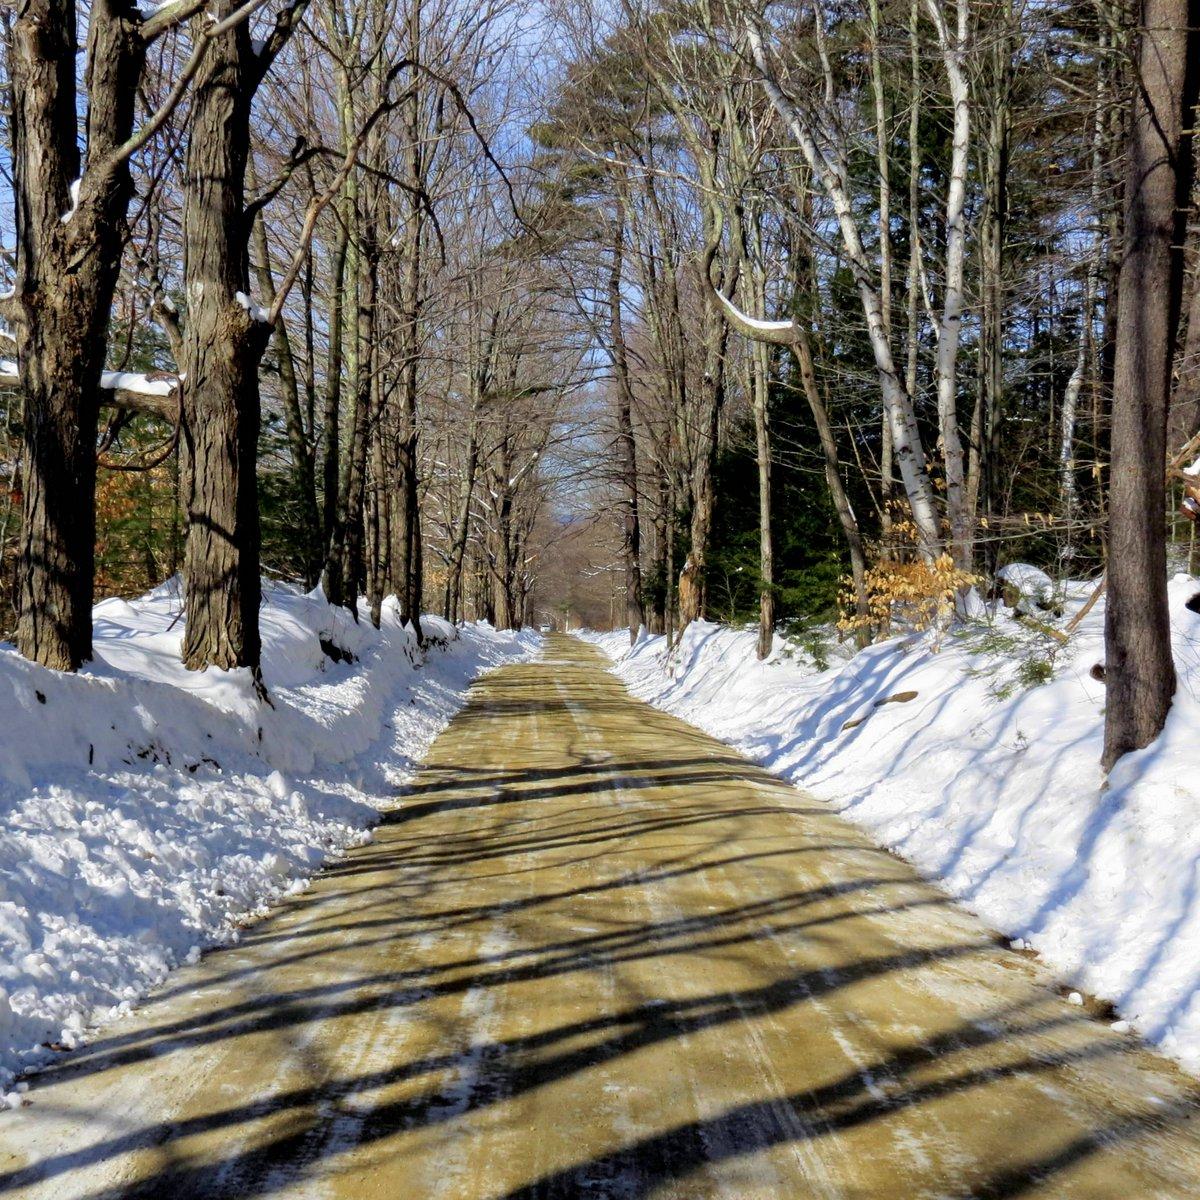 1-snowy-road.jpg